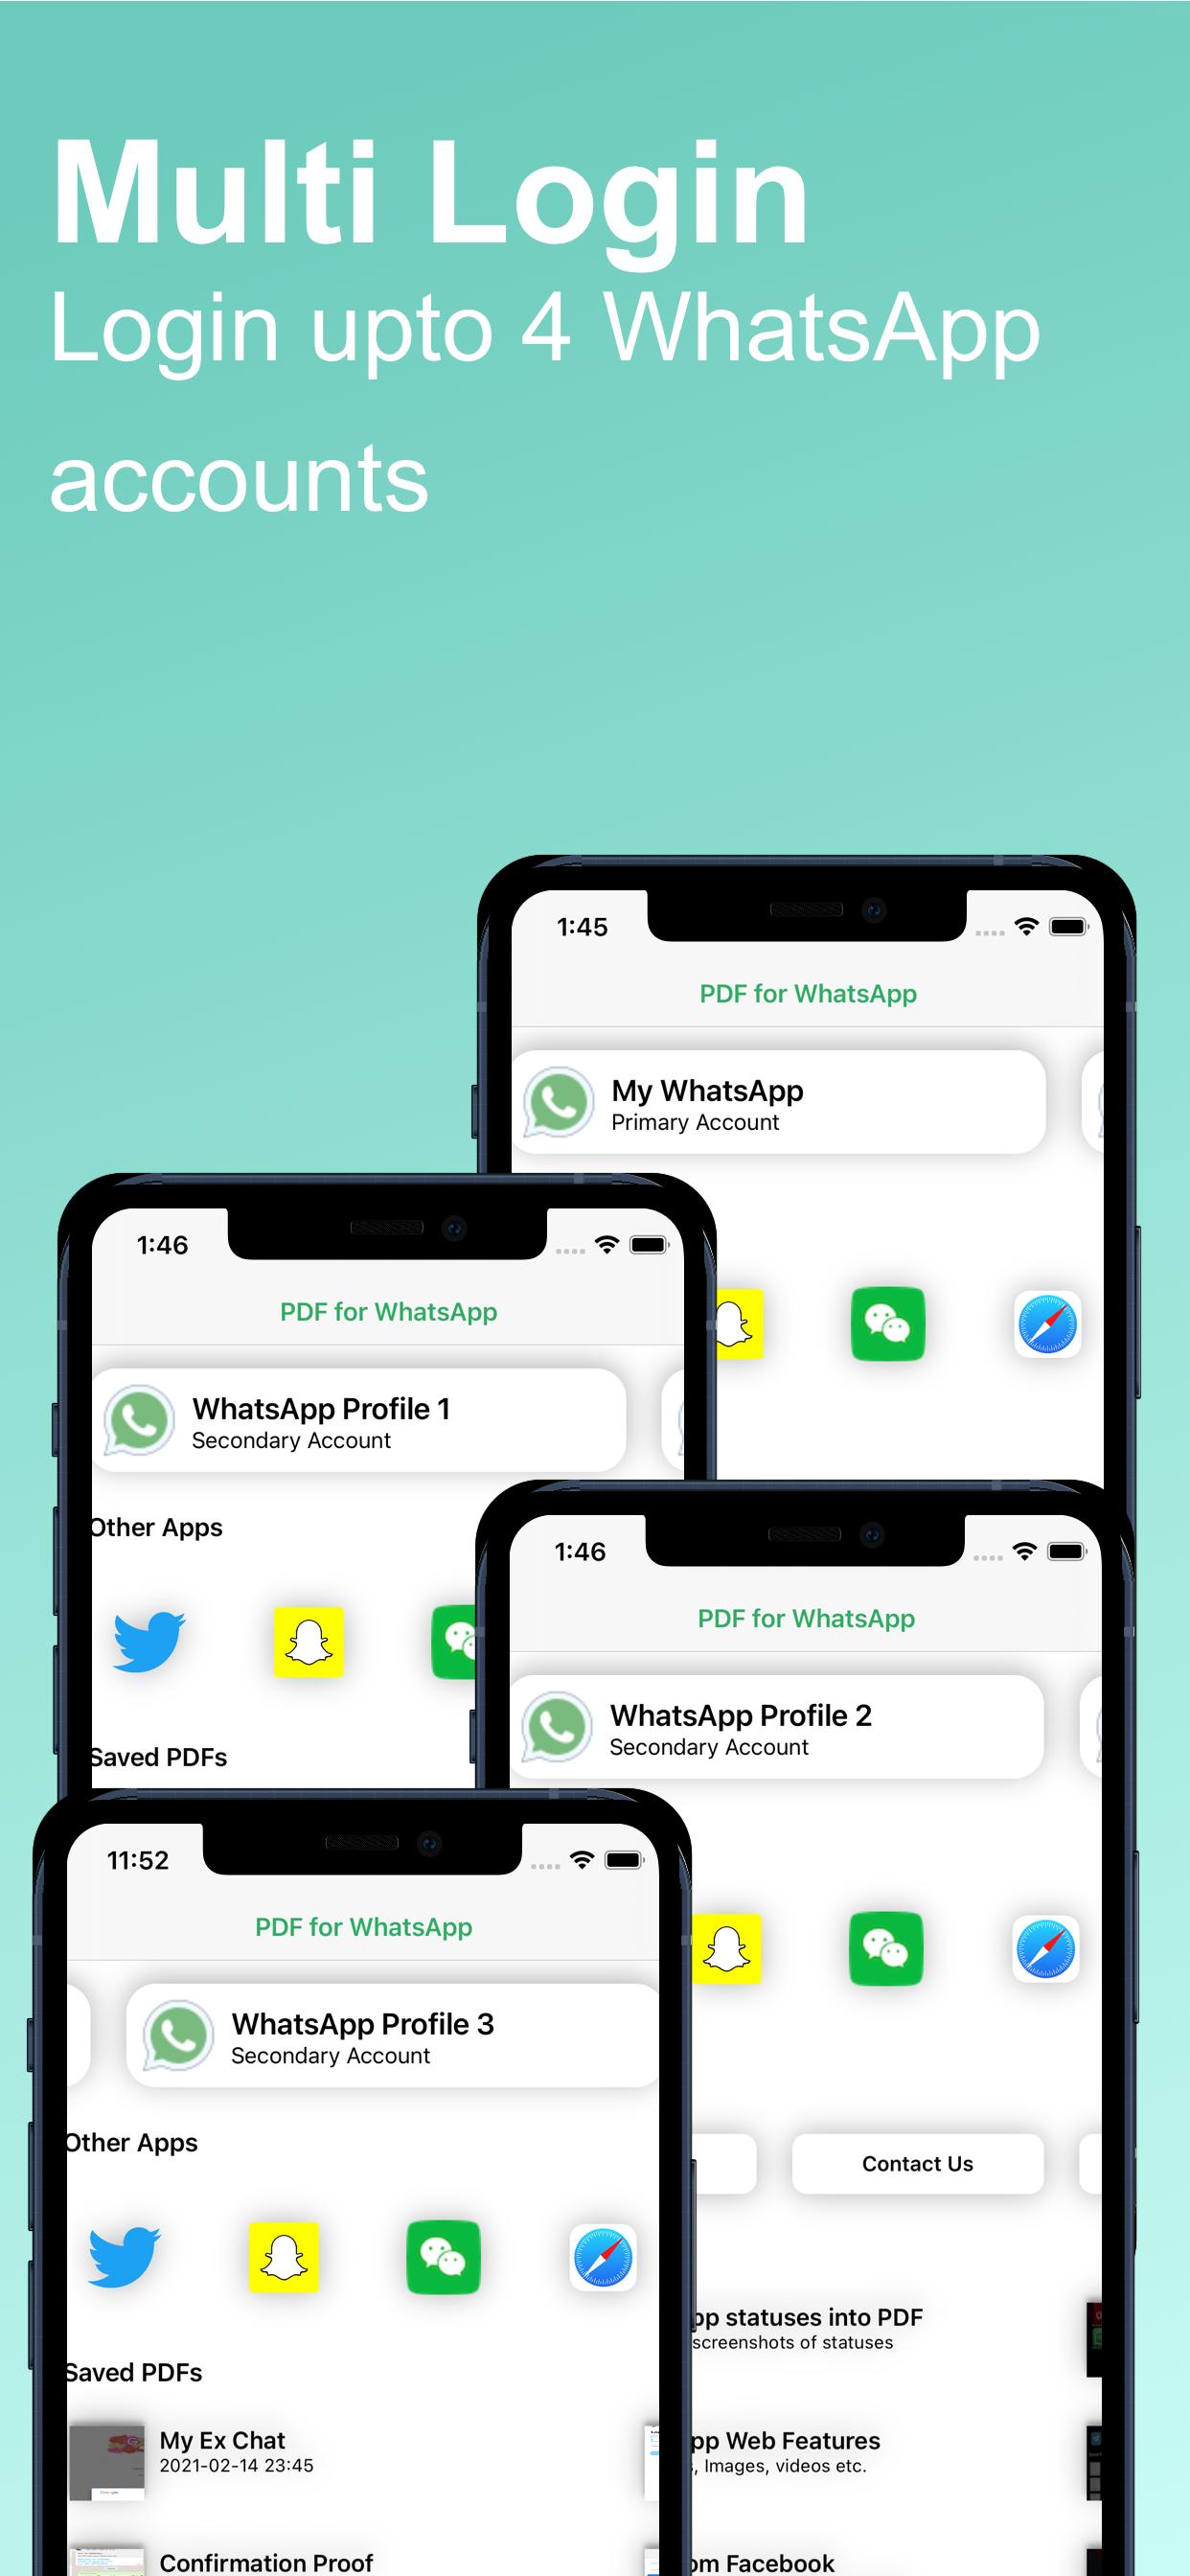 PDF for WhatsApp: Multi Login